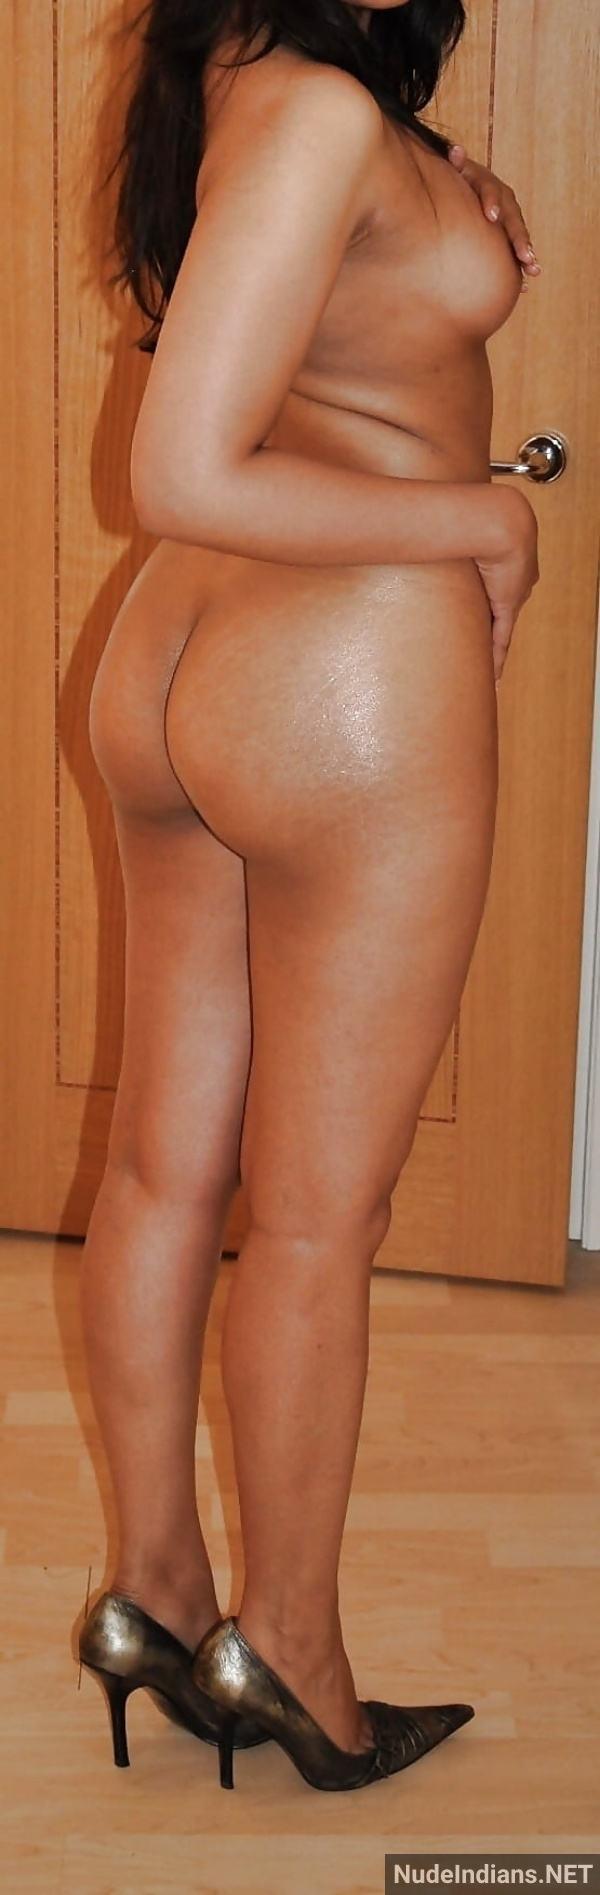 desi big ass bhabhi xxx image hd nude indian booty - 8